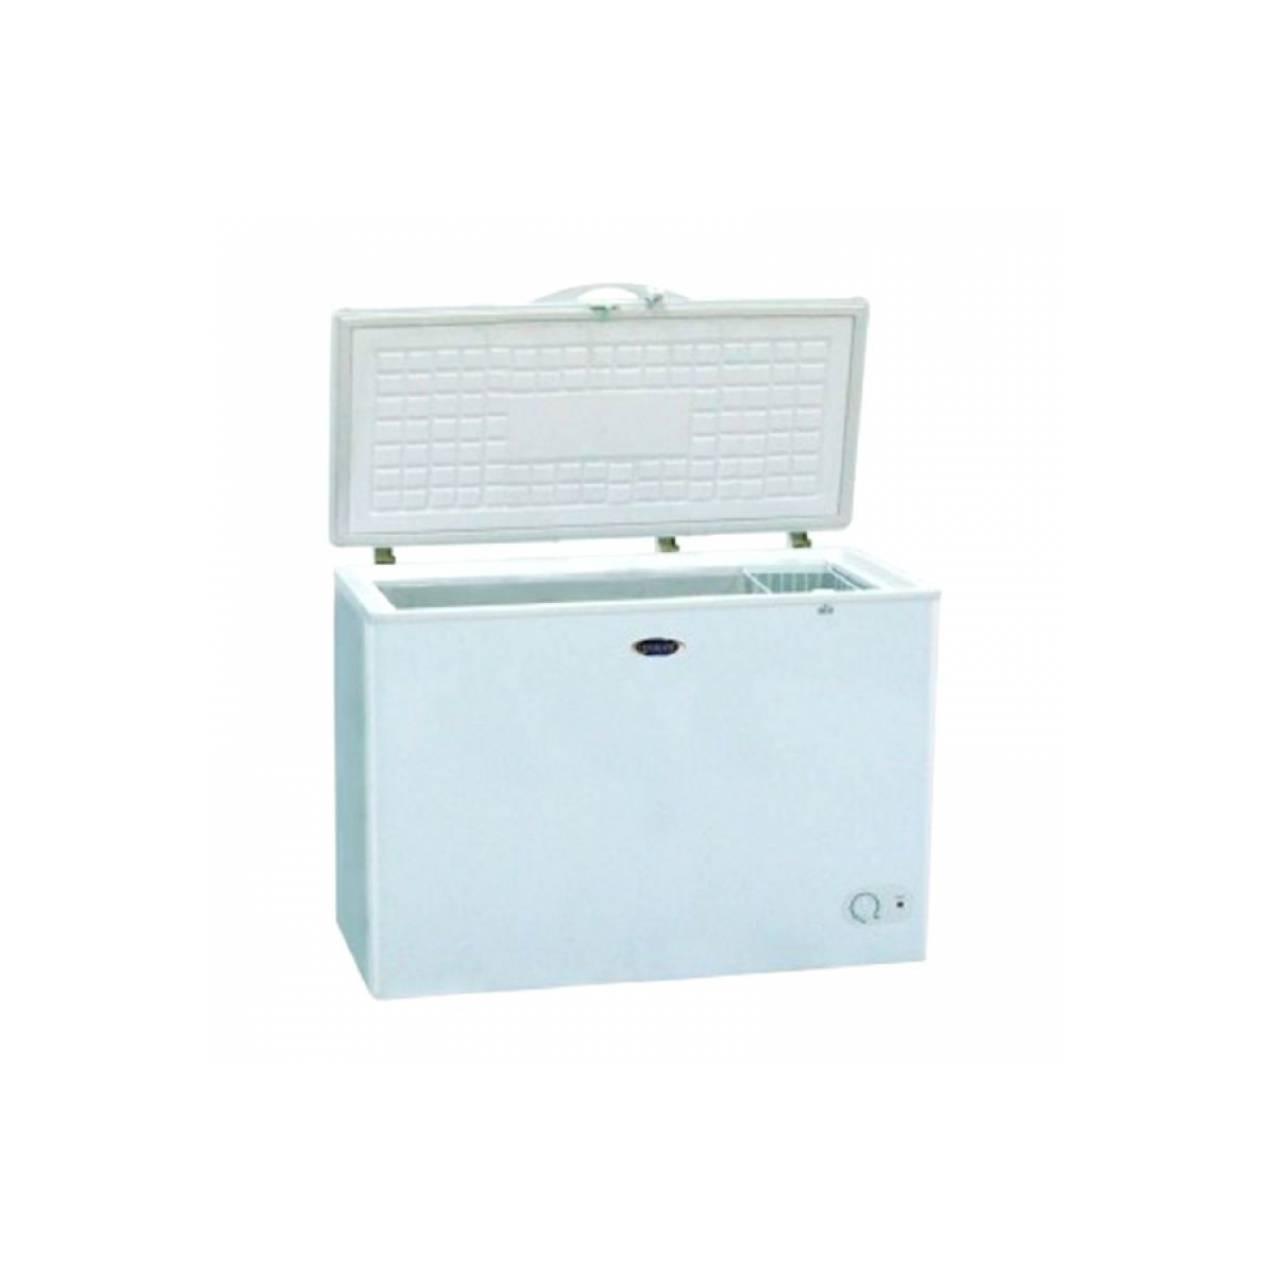 Frigigate Chest Freezer CFR-300, buat simpan DAGING